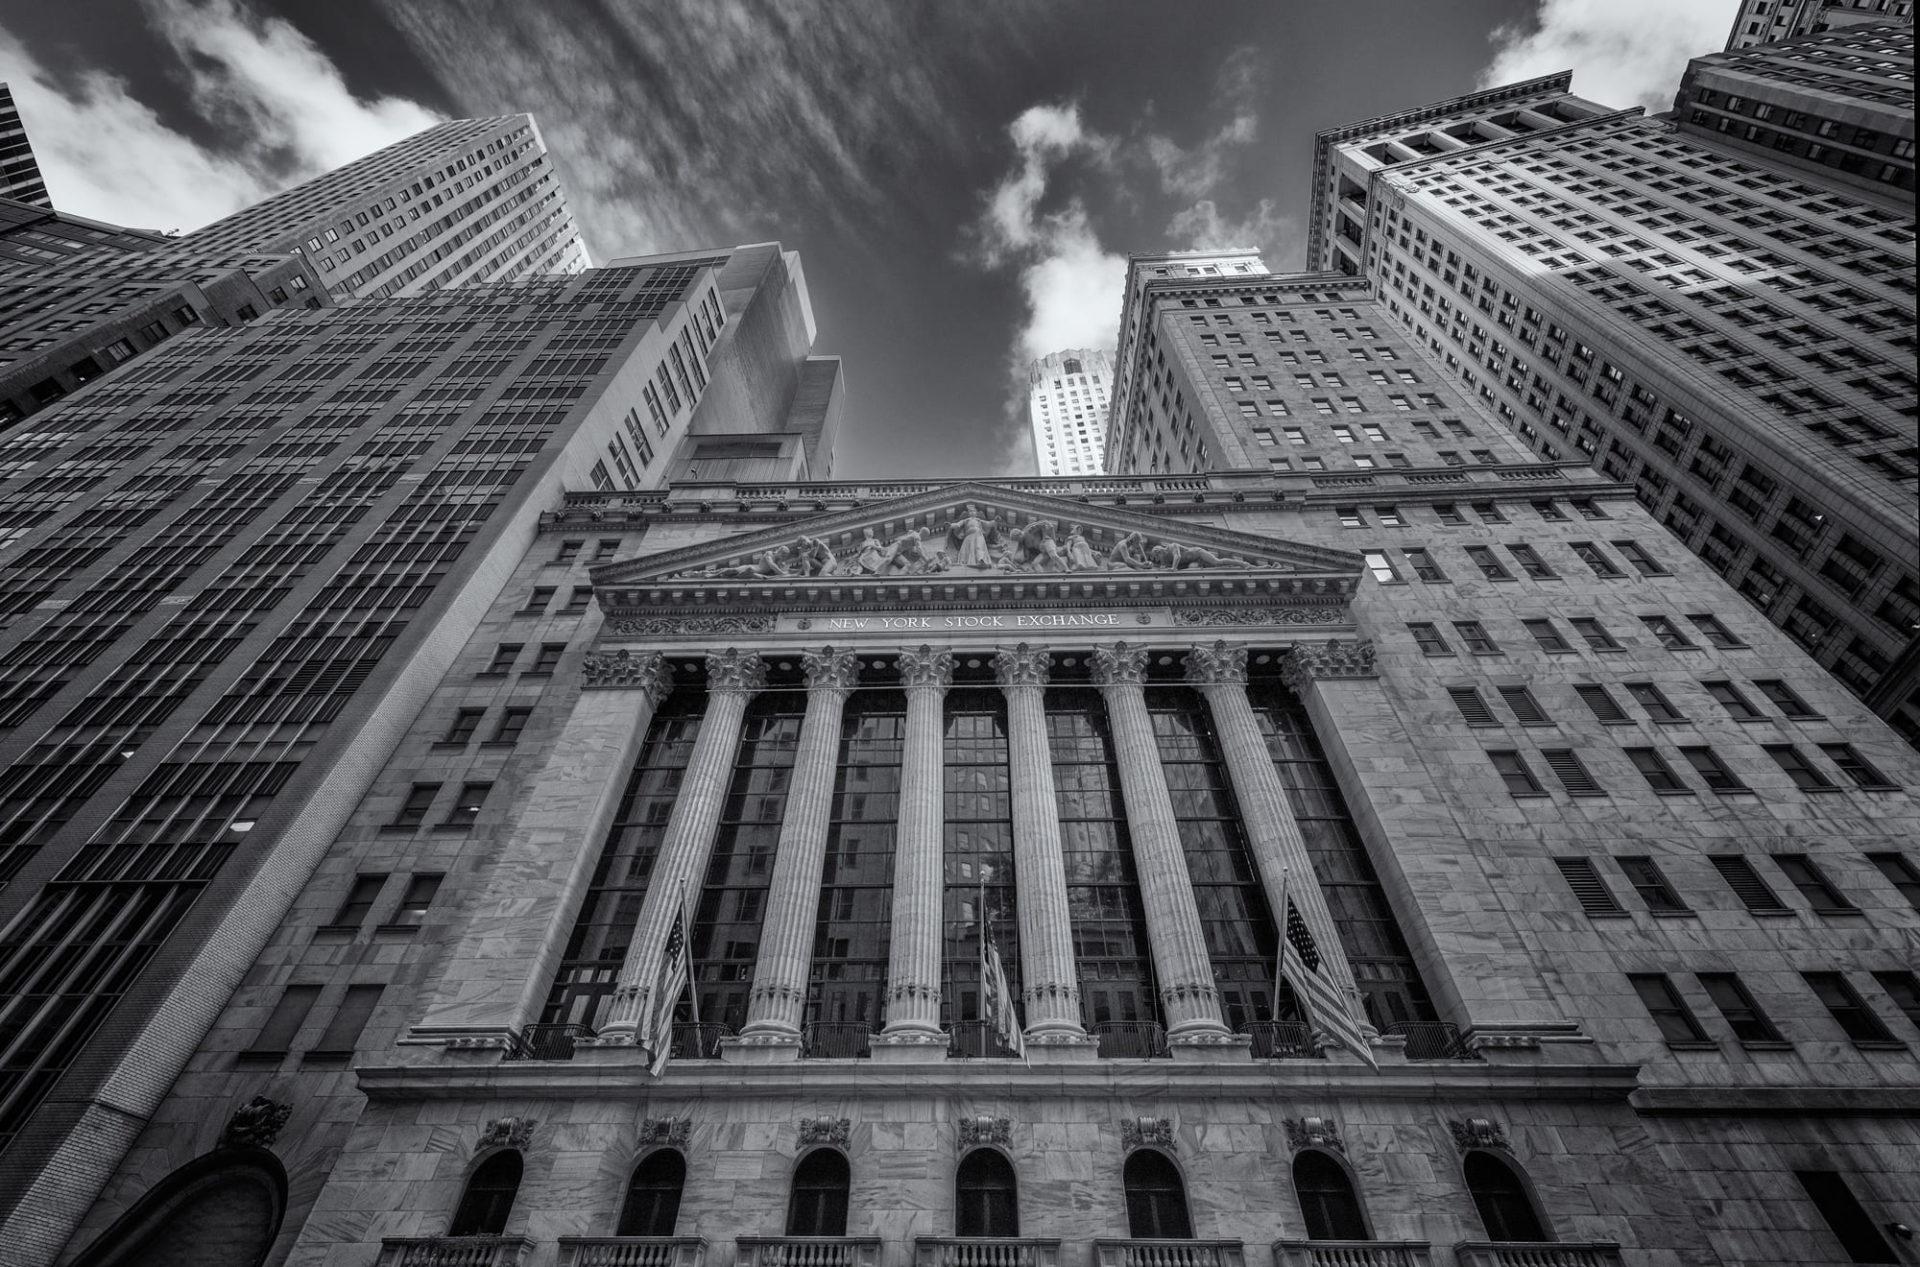 計量交易:建立自己的演算法交易事業(Quantitative Trading: How to Build Your Own Algorithmic Trading Business)讀後感